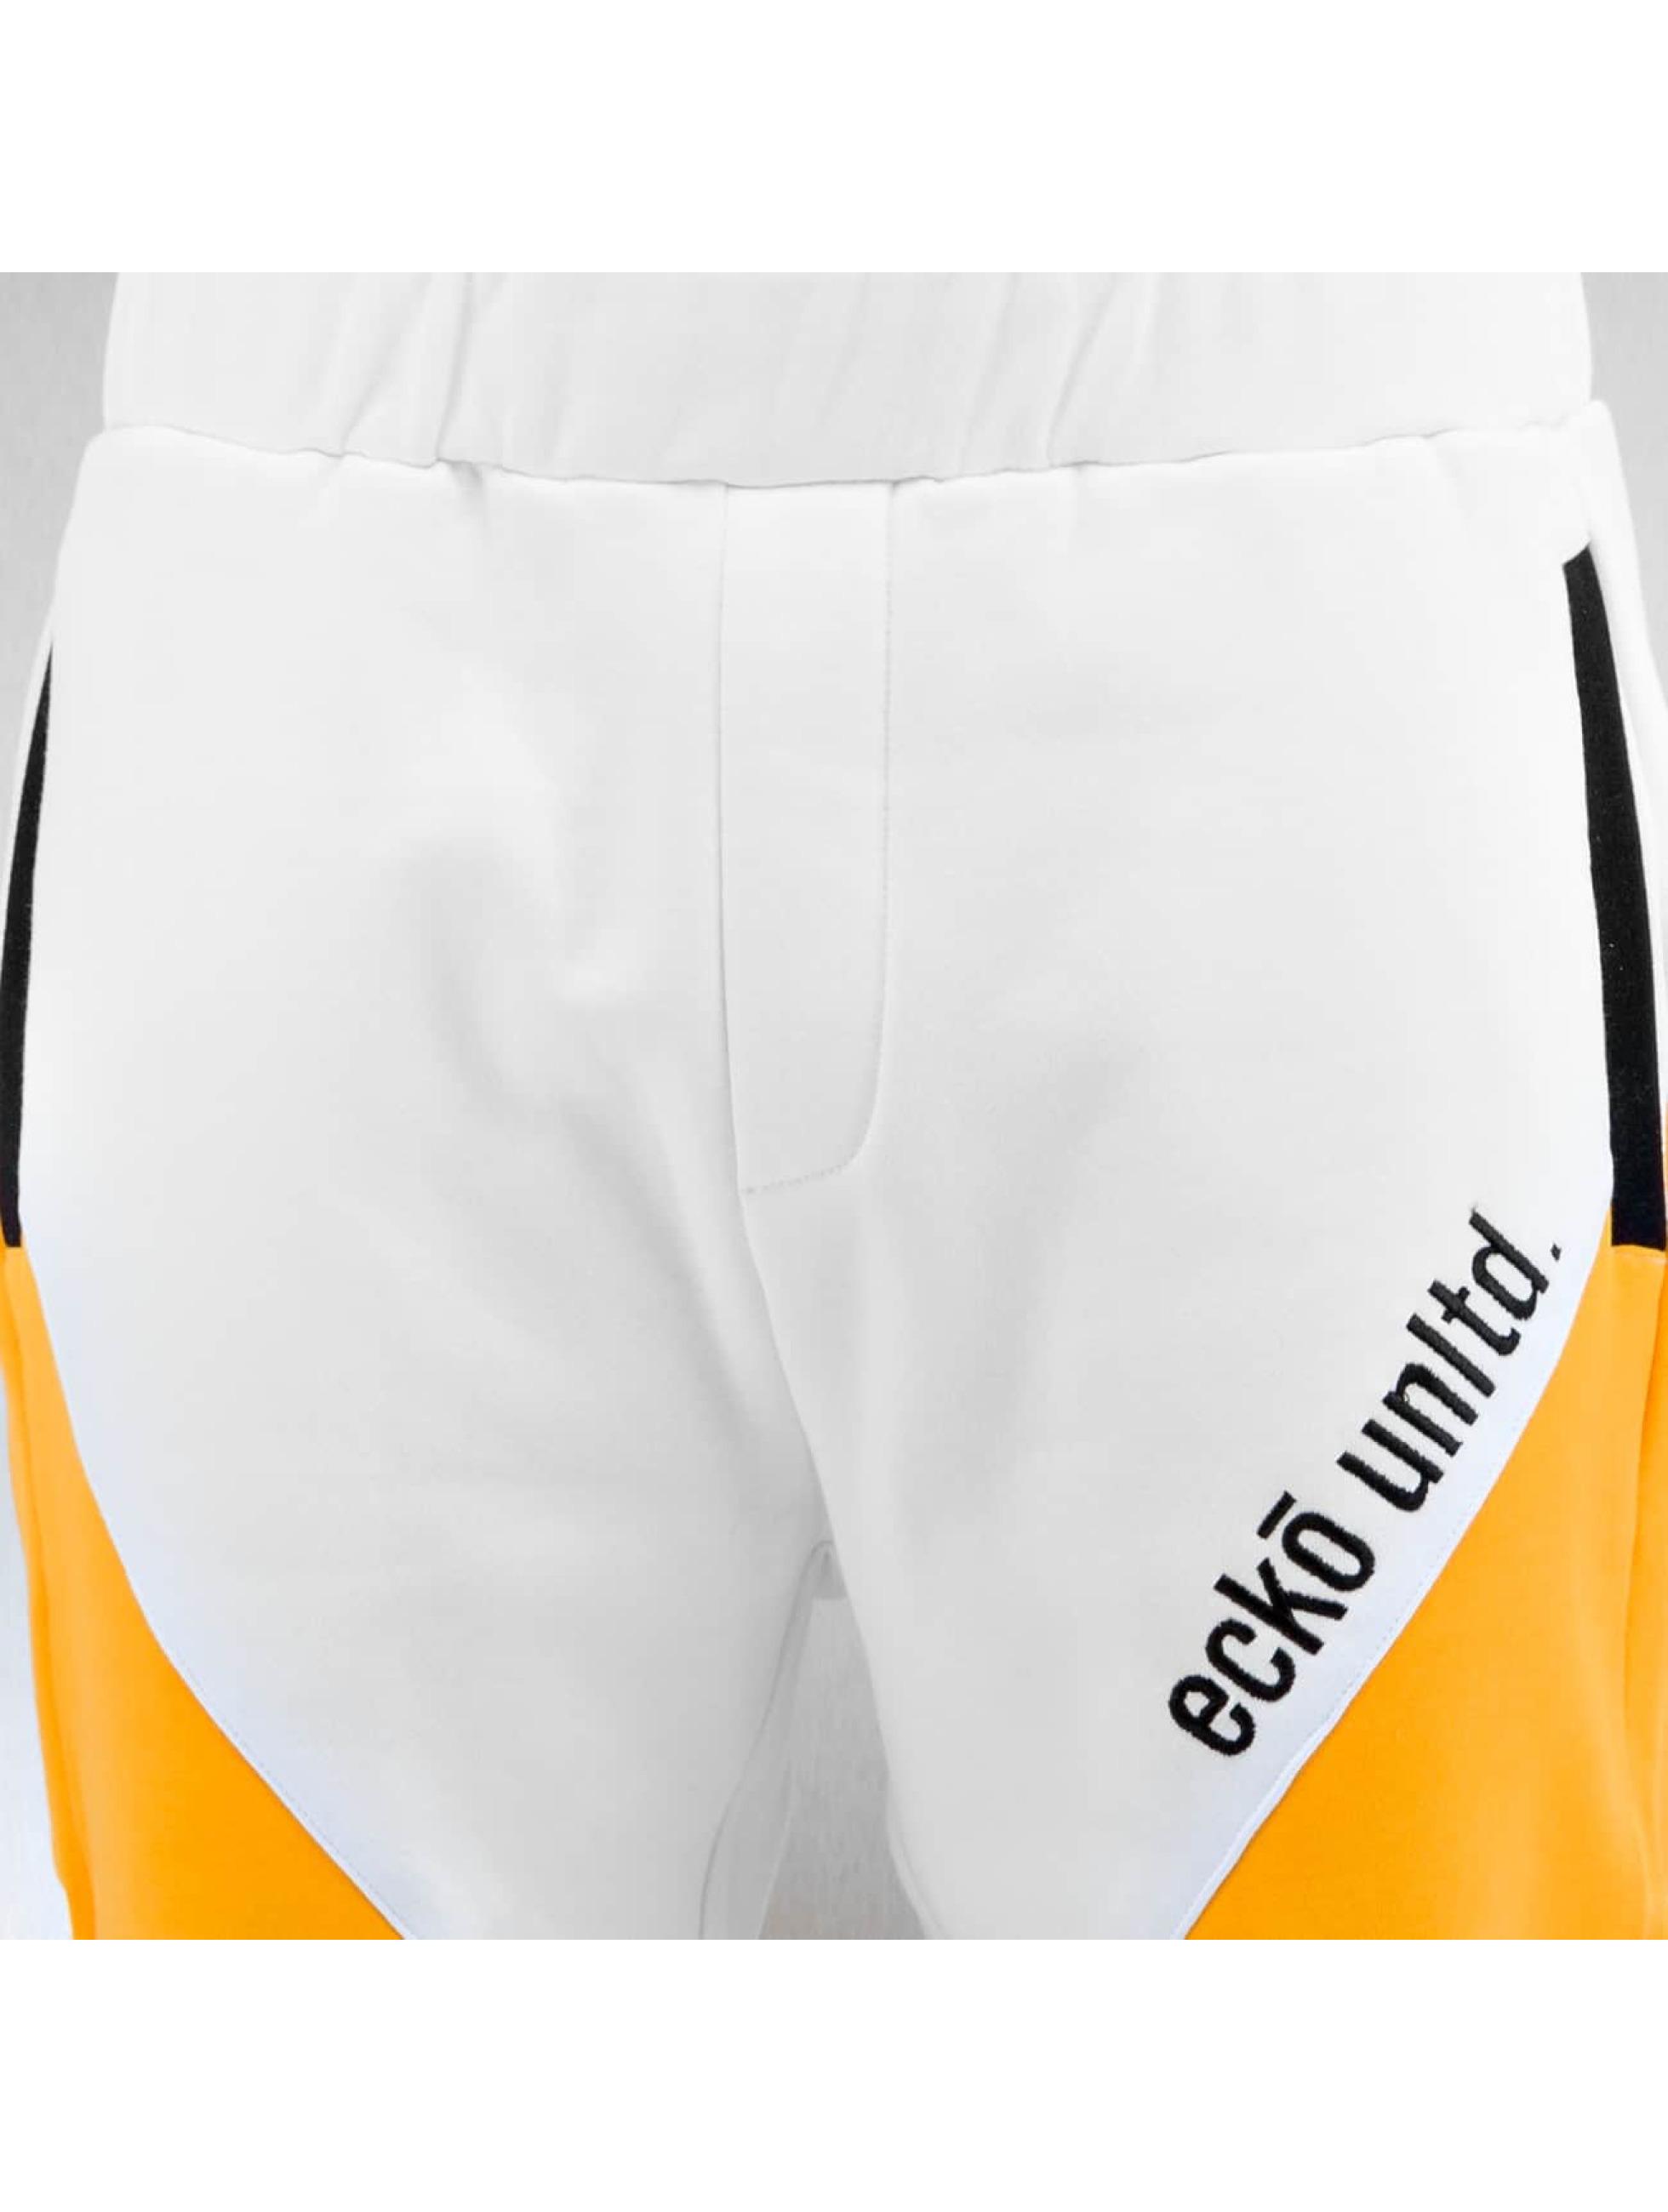 Ecko Unltd. Sweat Pant Flashback white